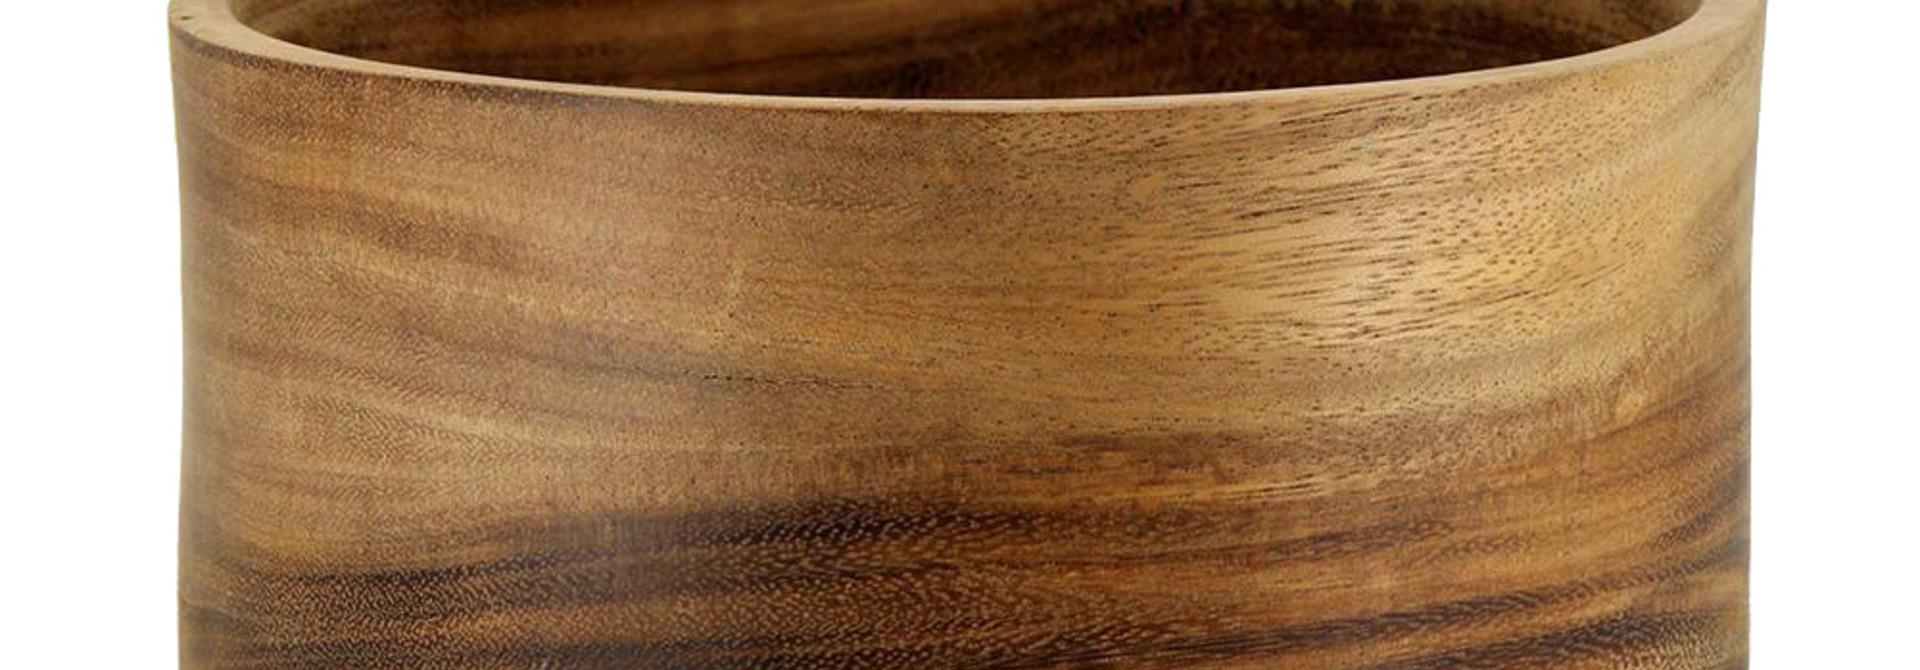 Acacia Wood Serving Bowl - Medium